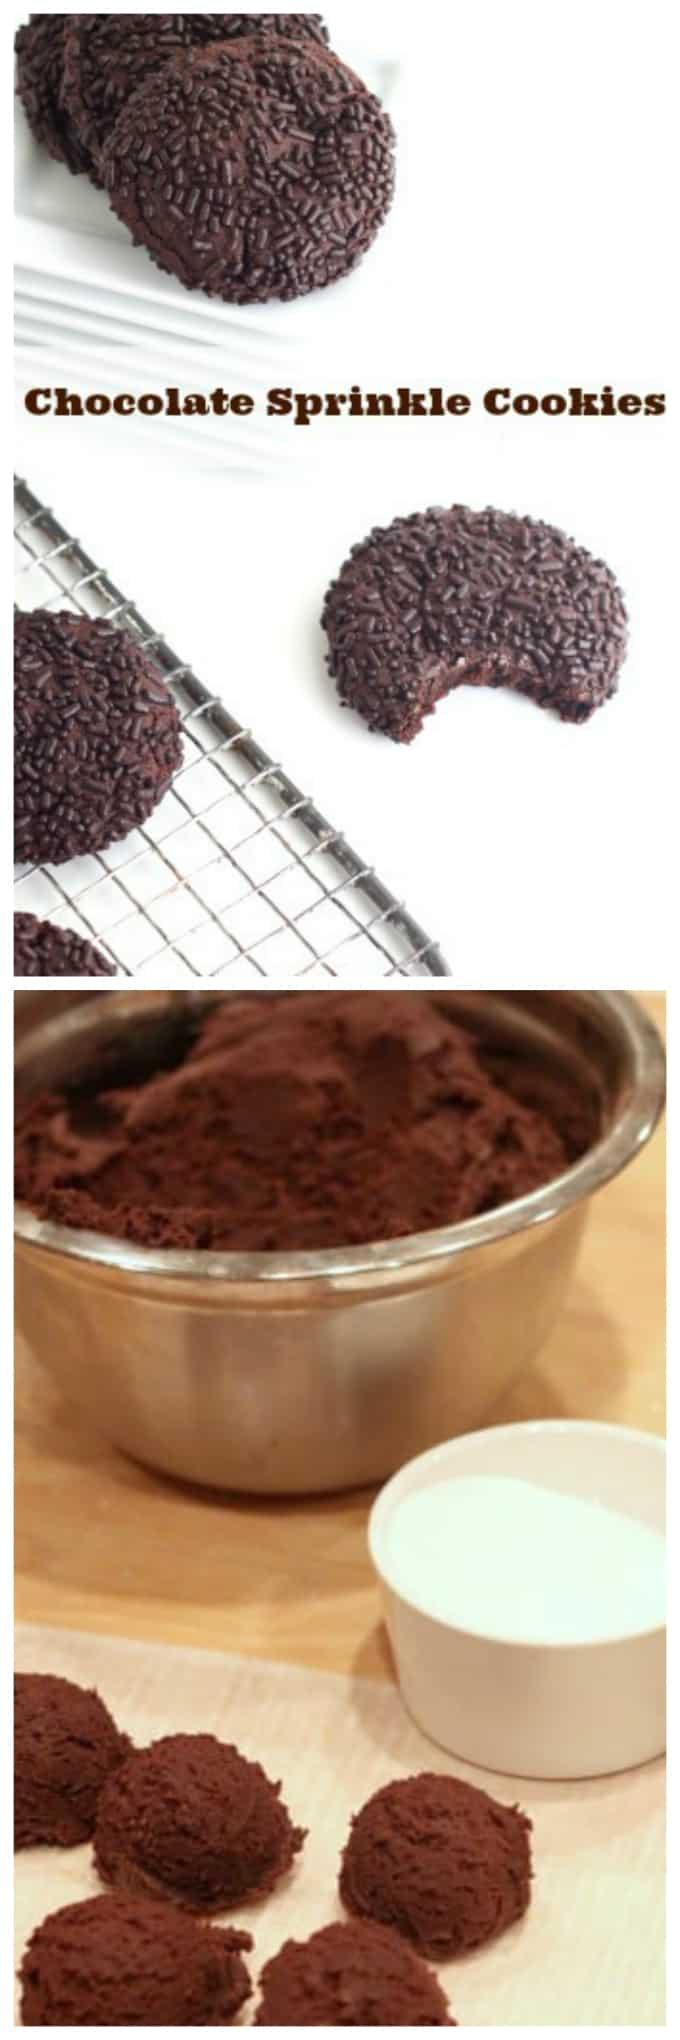 chocolate sprinkle cookies www.createdbydiane.com